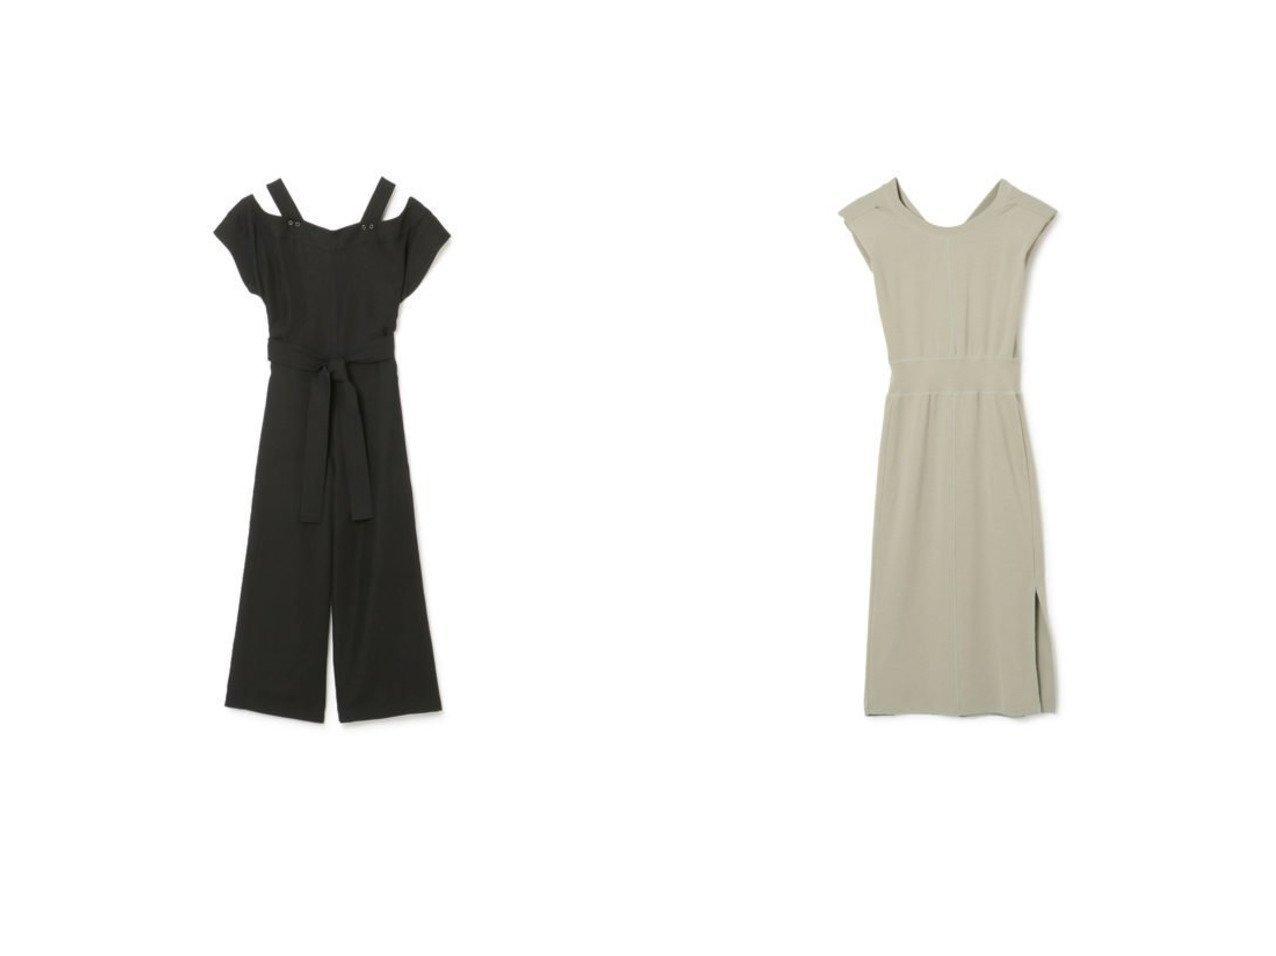 【QUWAGI/クワギ】のJUMPSUIT&SHOULDER DRESS 【ワンピース・ドレス】おすすめ!人気、トレンド・レディースファッションの通販 おすすめで人気の流行・トレンド、ファッションの通販商品 メンズファッション・キッズファッション・インテリア・家具・レディースファッション・服の通販 founy(ファニー) https://founy.com/ ファッション Fashion レディースファッション WOMEN ワンピース Dress ドレス Party Dresses オールインワン ワンピース All In One Dress サロペット Salopette 2021年 2021 2021春夏・S/S SS/Spring/Summer/2021 S/S・春夏 SS・Spring/Summer スリット スリム ドレス ノースリーブ フェミニン フォーマル ロング 洗える カッティング コンパクト ストレート デコルテ ボトム |ID:crp329100000031144